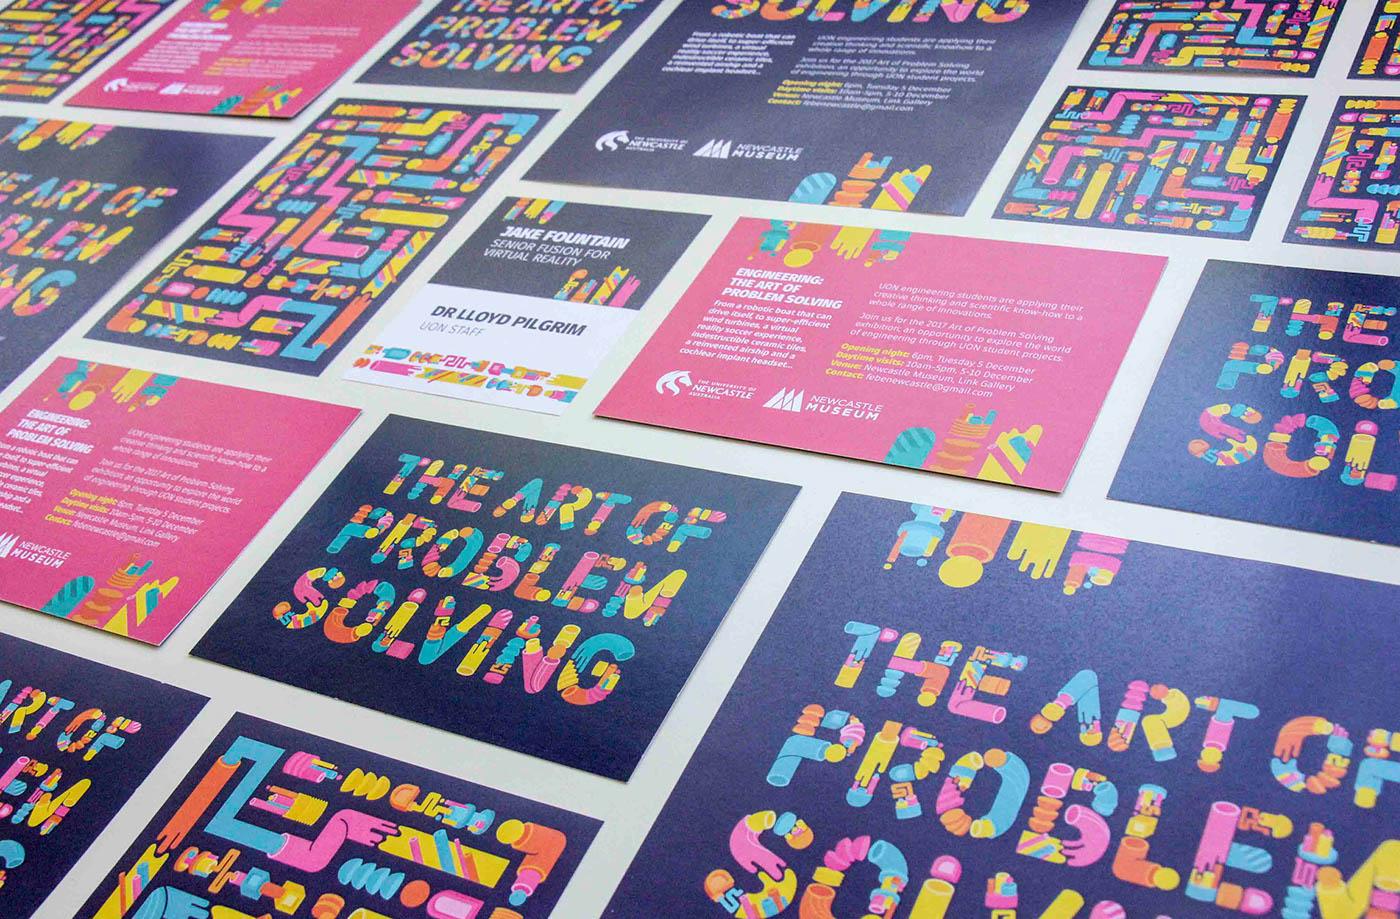 graphic design  typography   HAND LETTERING lettering Illustrative Illustrative lettering branding  Exhibition  Exhibition Design